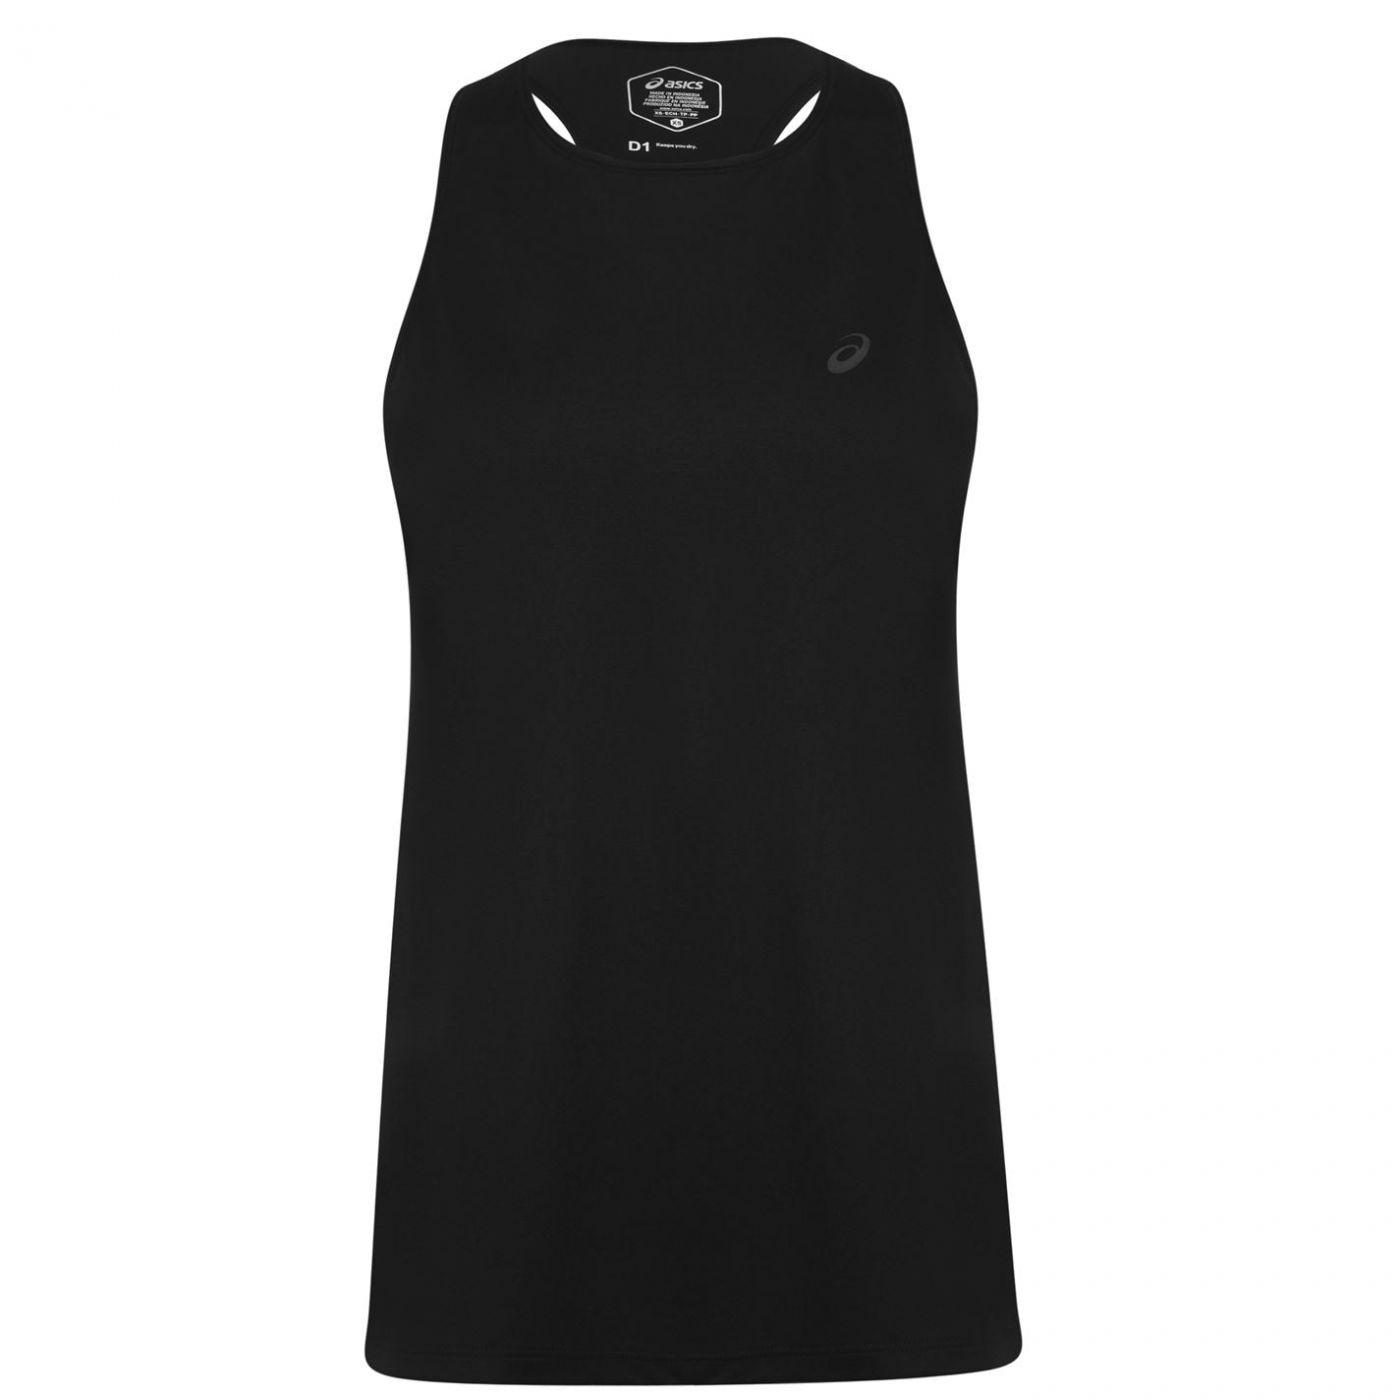 Asics Race Sleeveless T Shirt Ladies